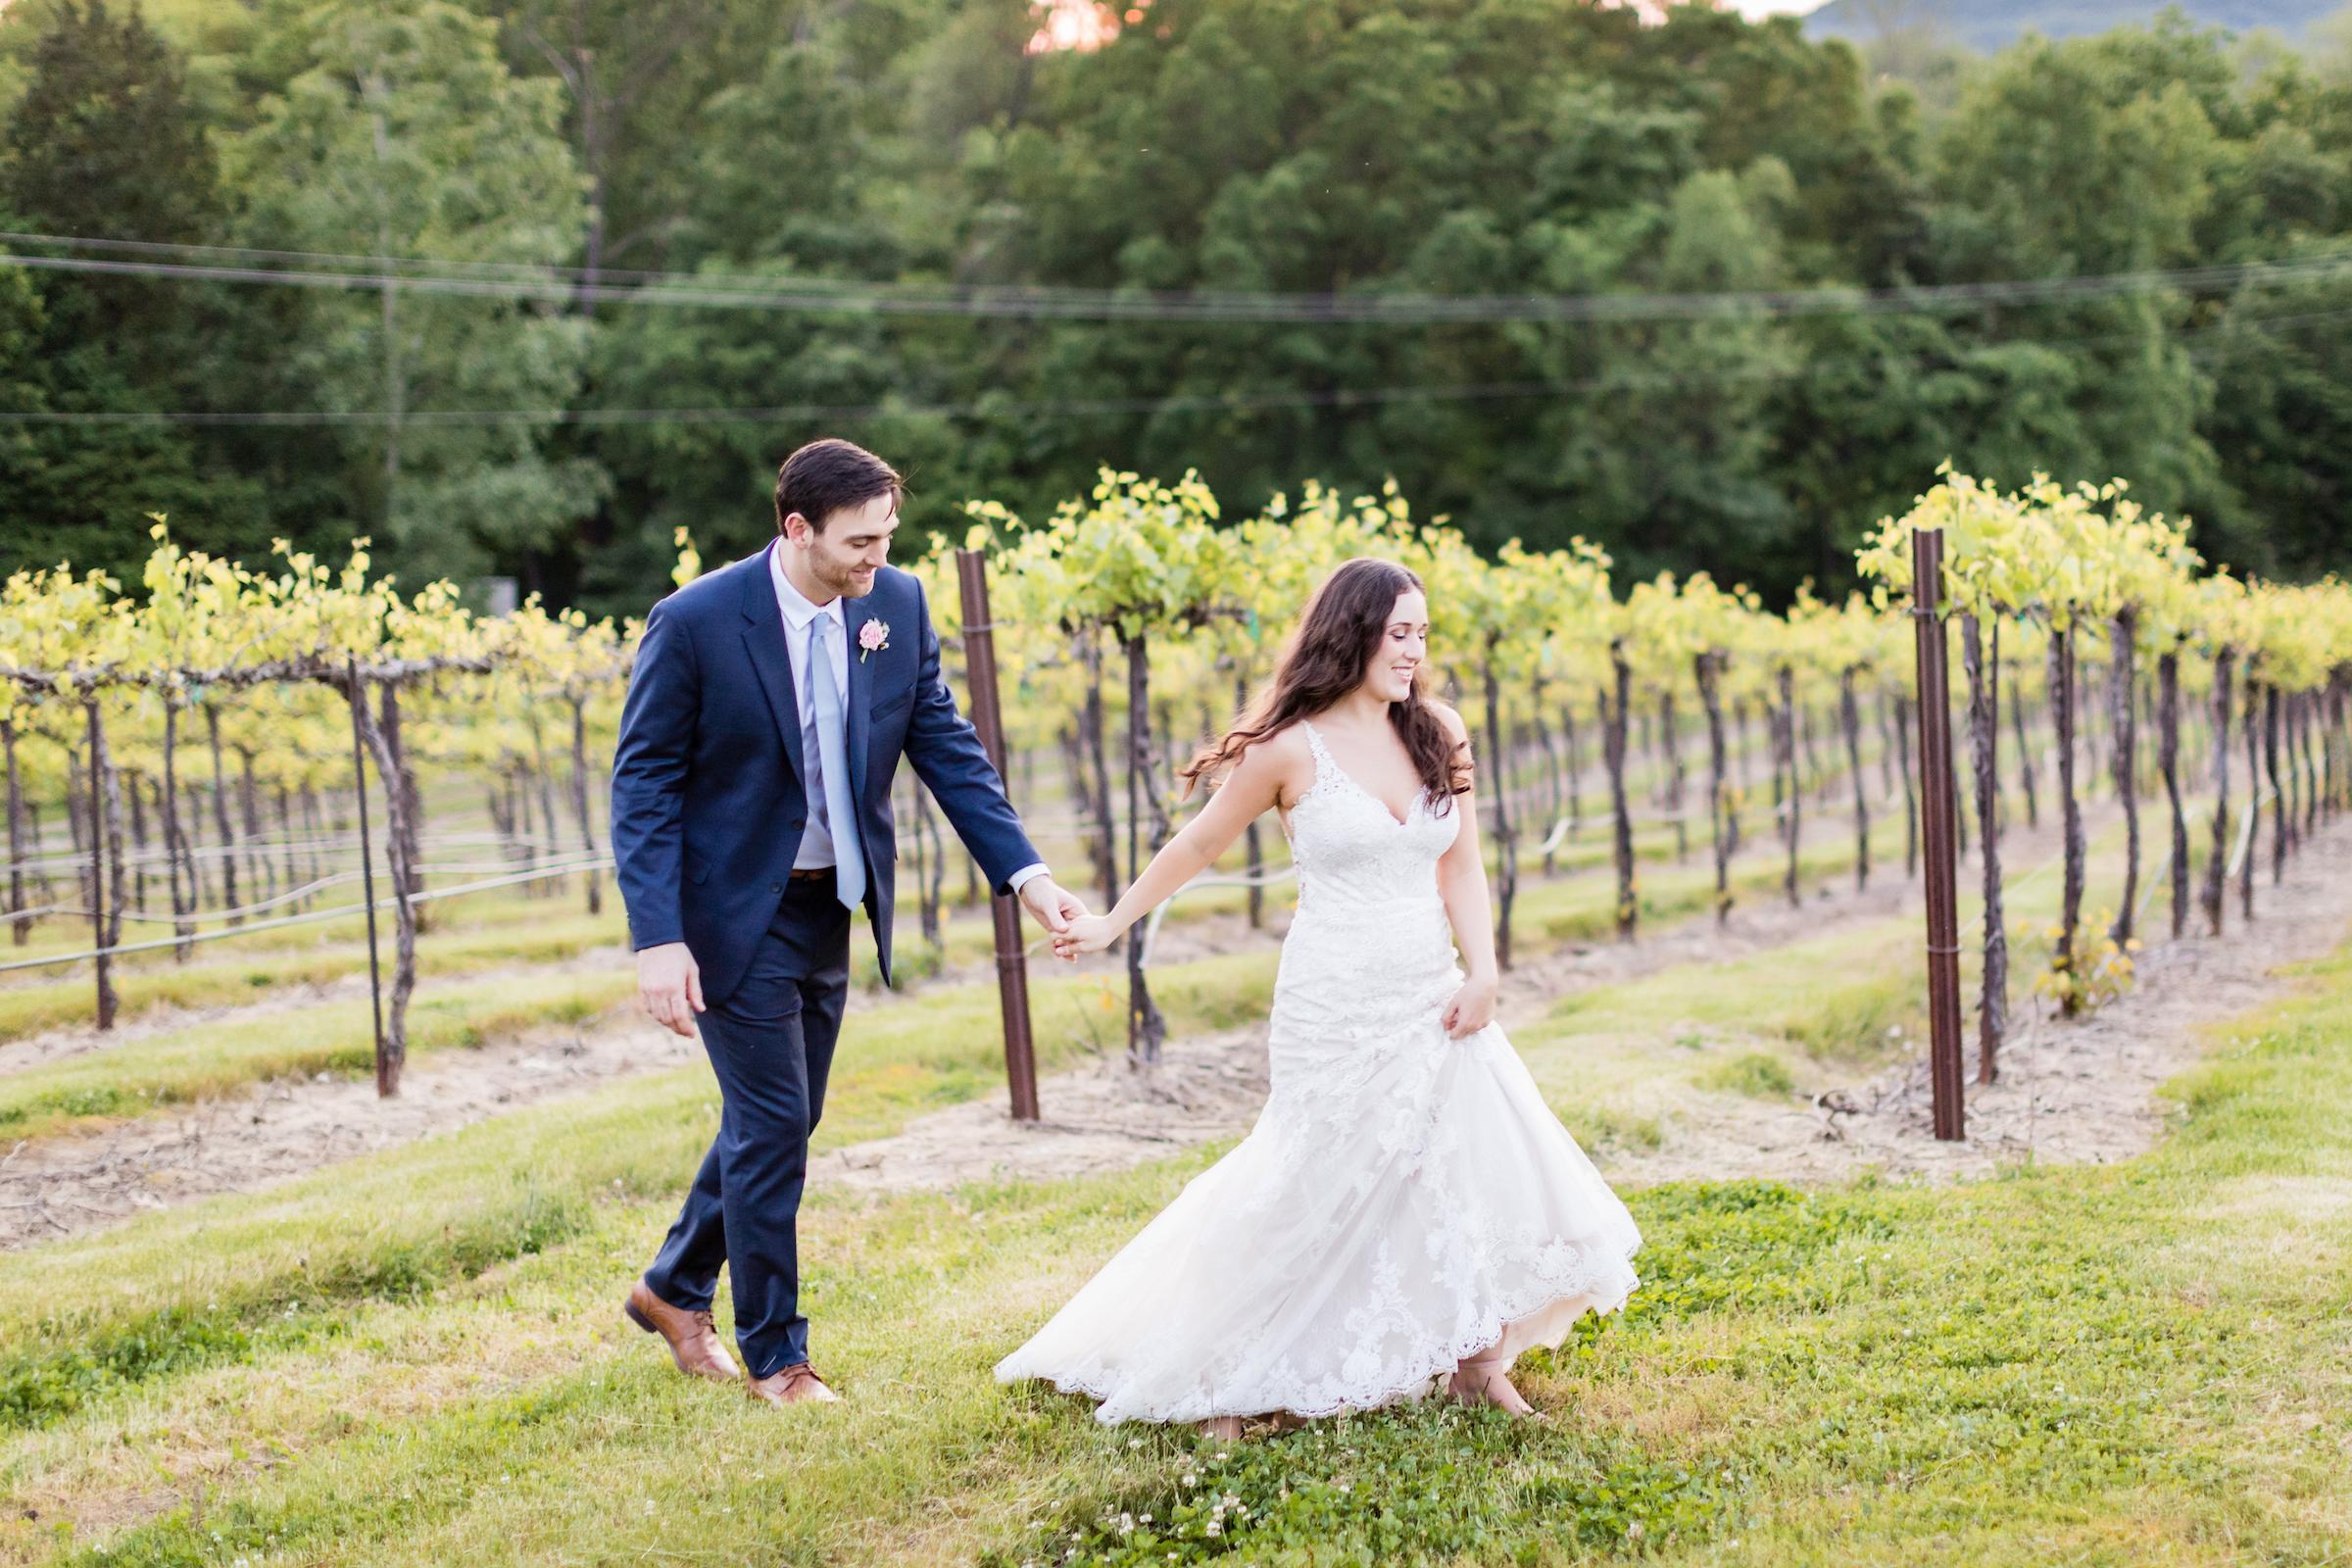 brielle-davis-events-kairos-photography-chandler-hill-wedding-592.jpg